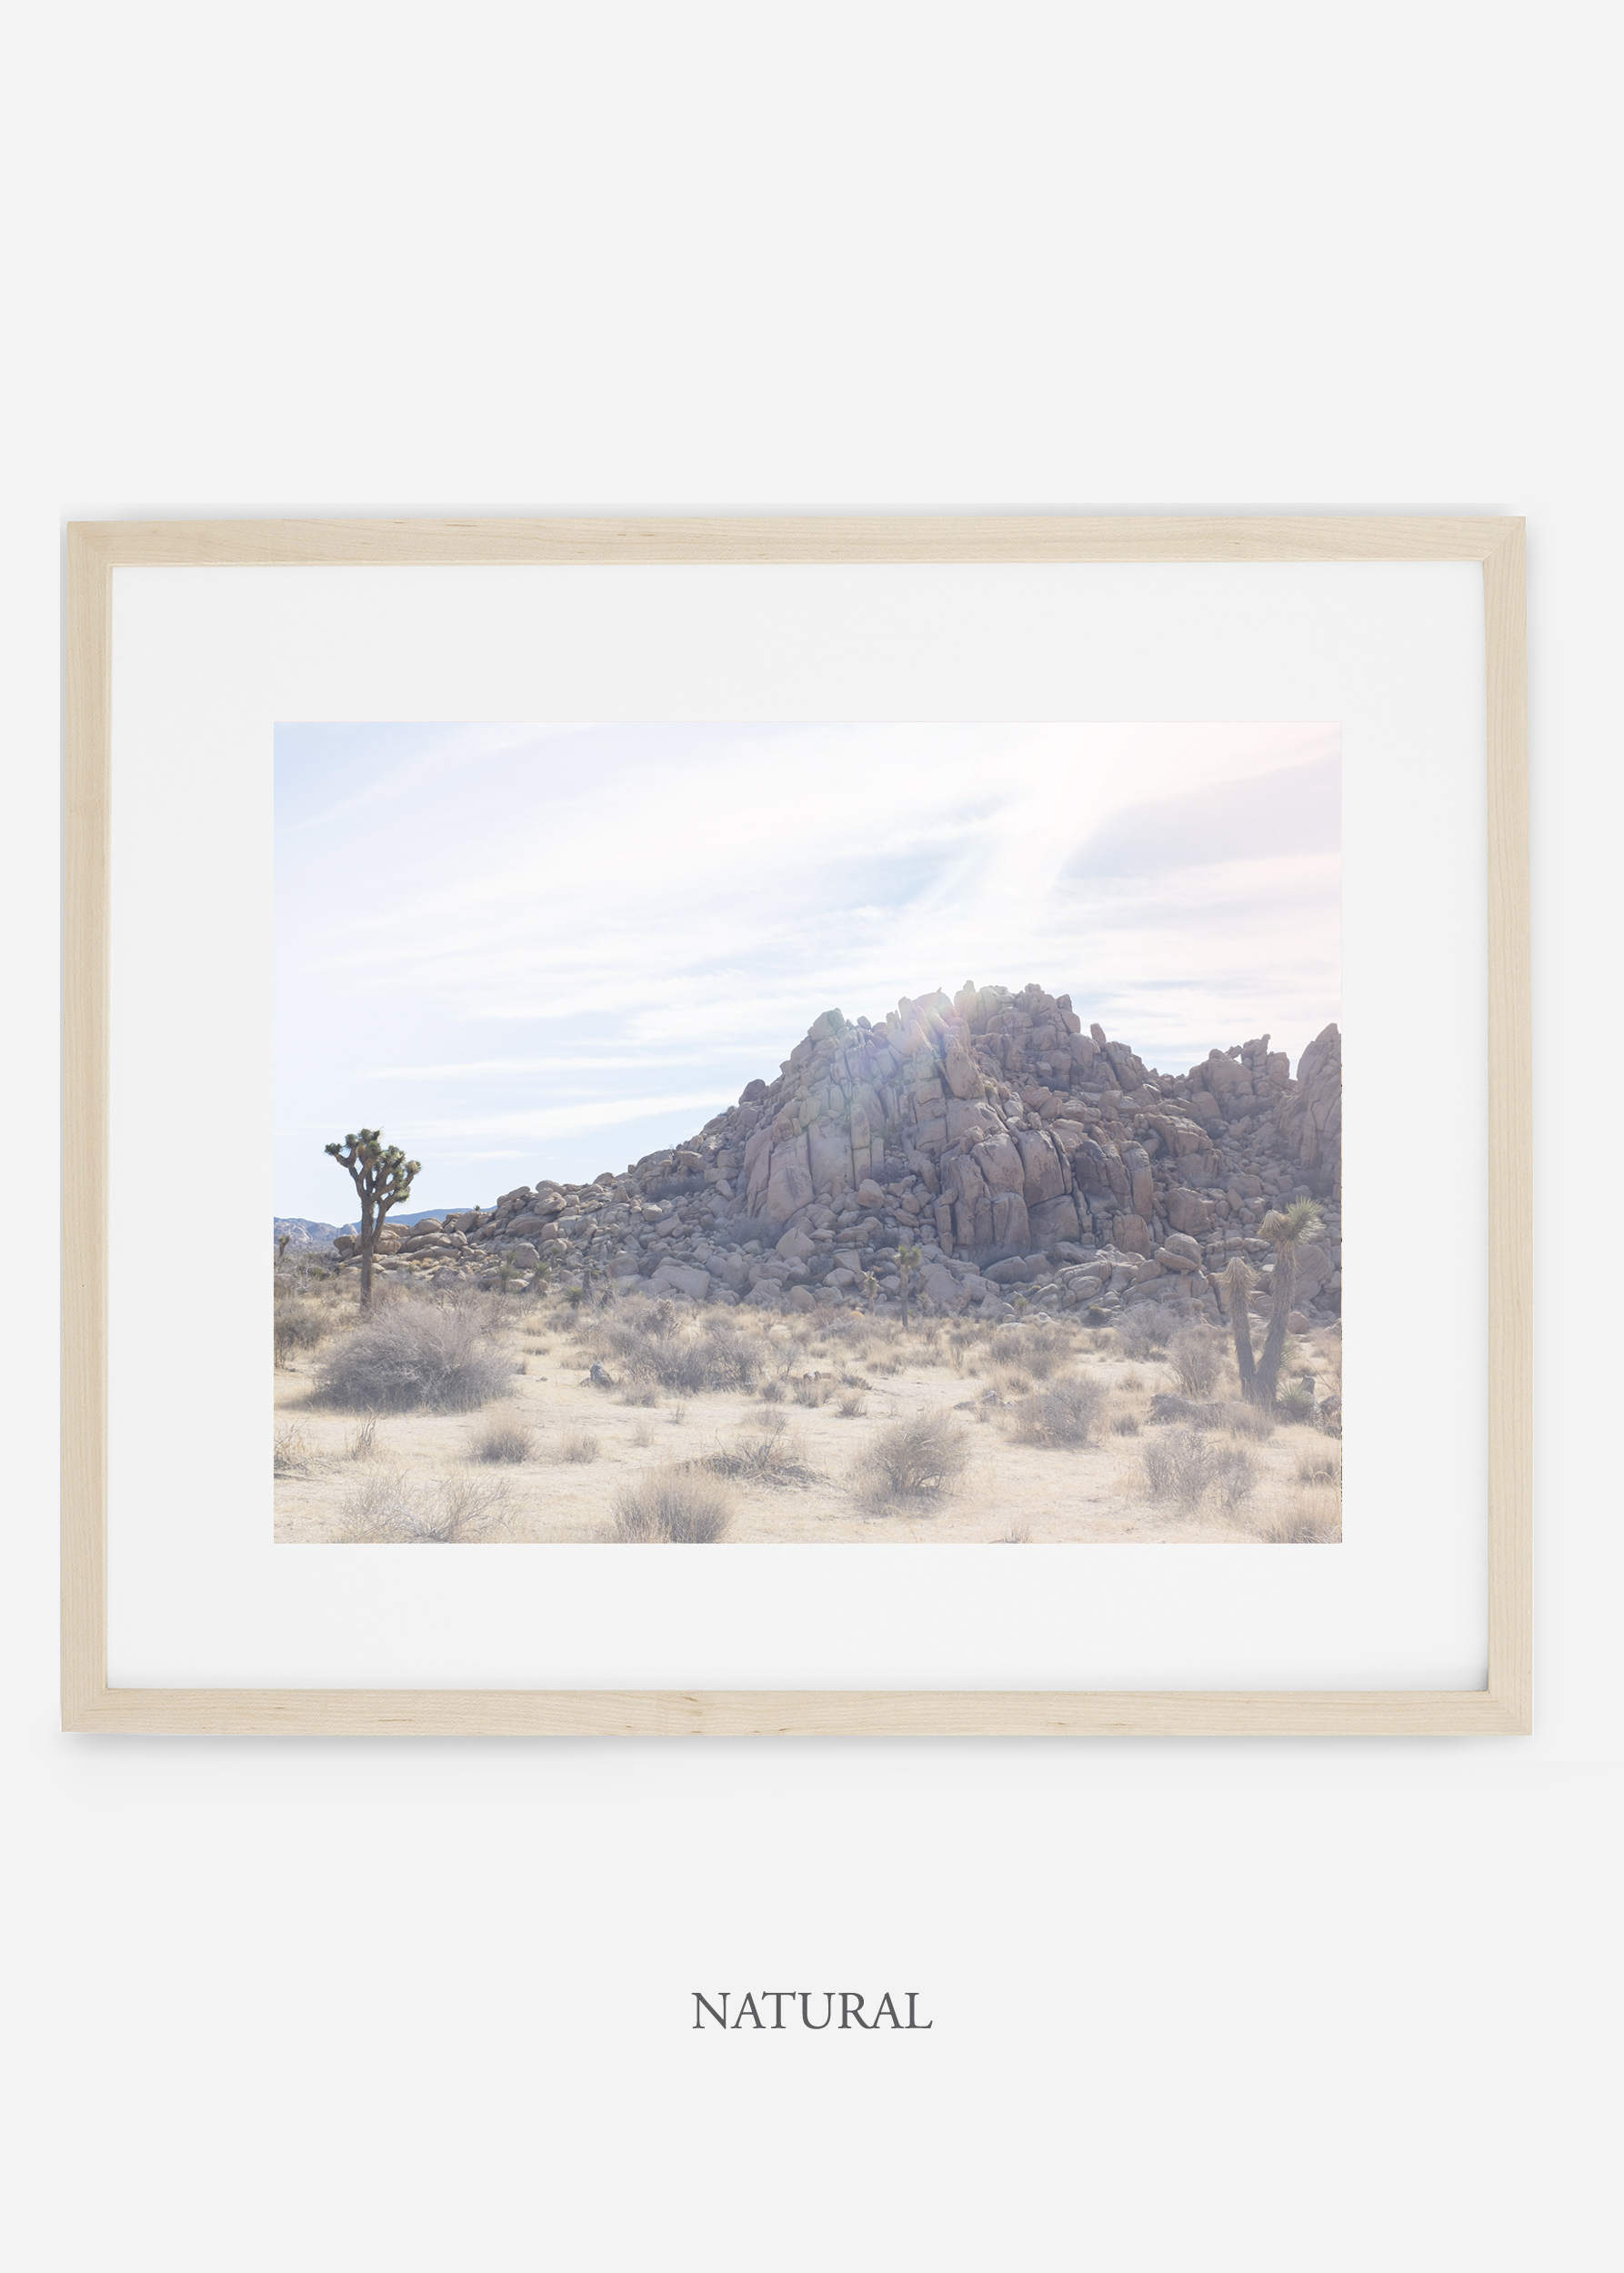 WilderCalifornia_natural_JoshuaTree_No.20_interiordesign_prints_art.jpg